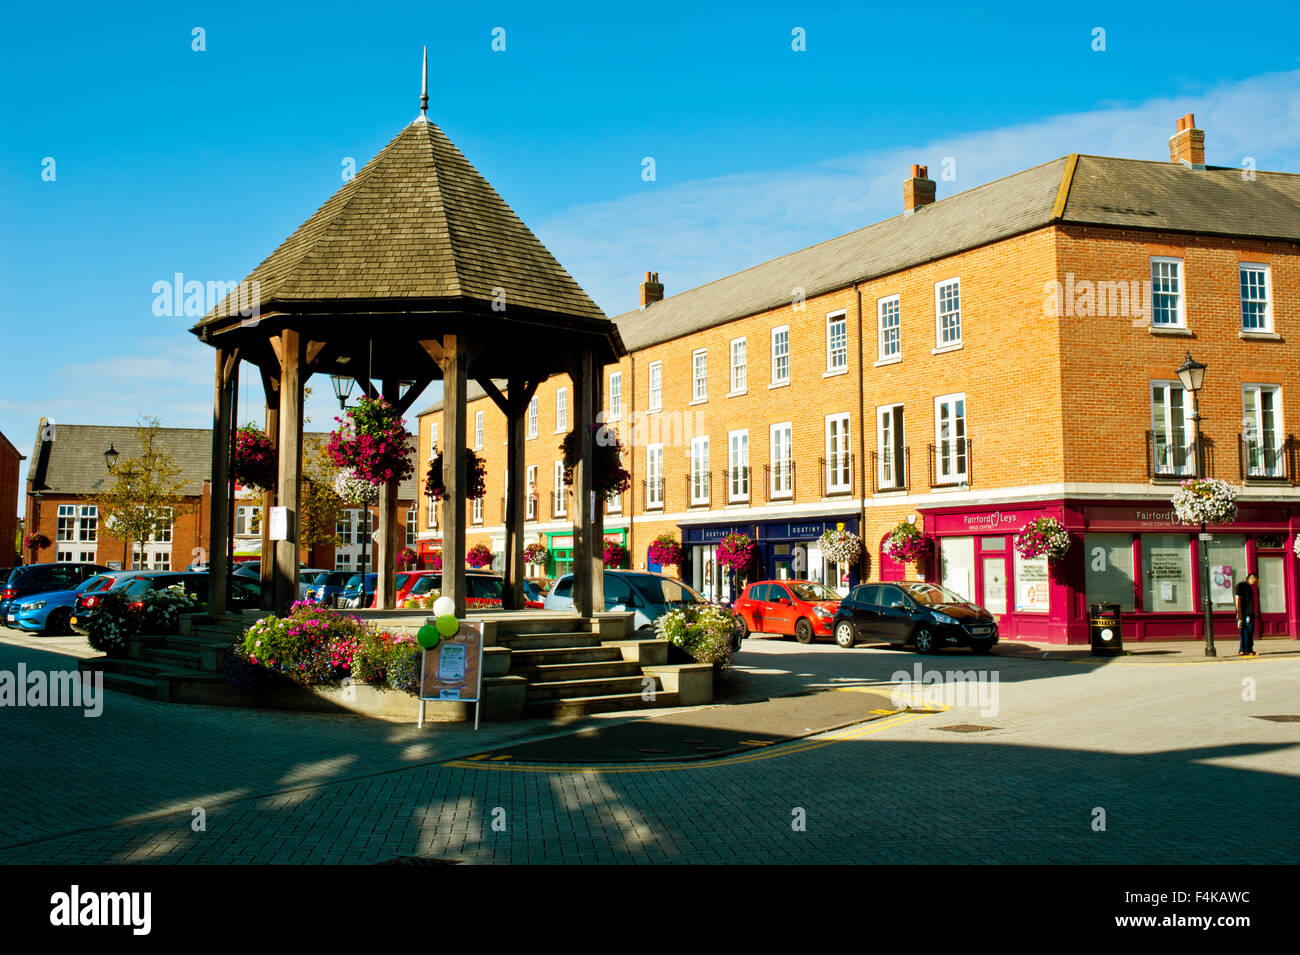 Fairford Leys, Aylesbury, Buckinghamshire - Stock Image